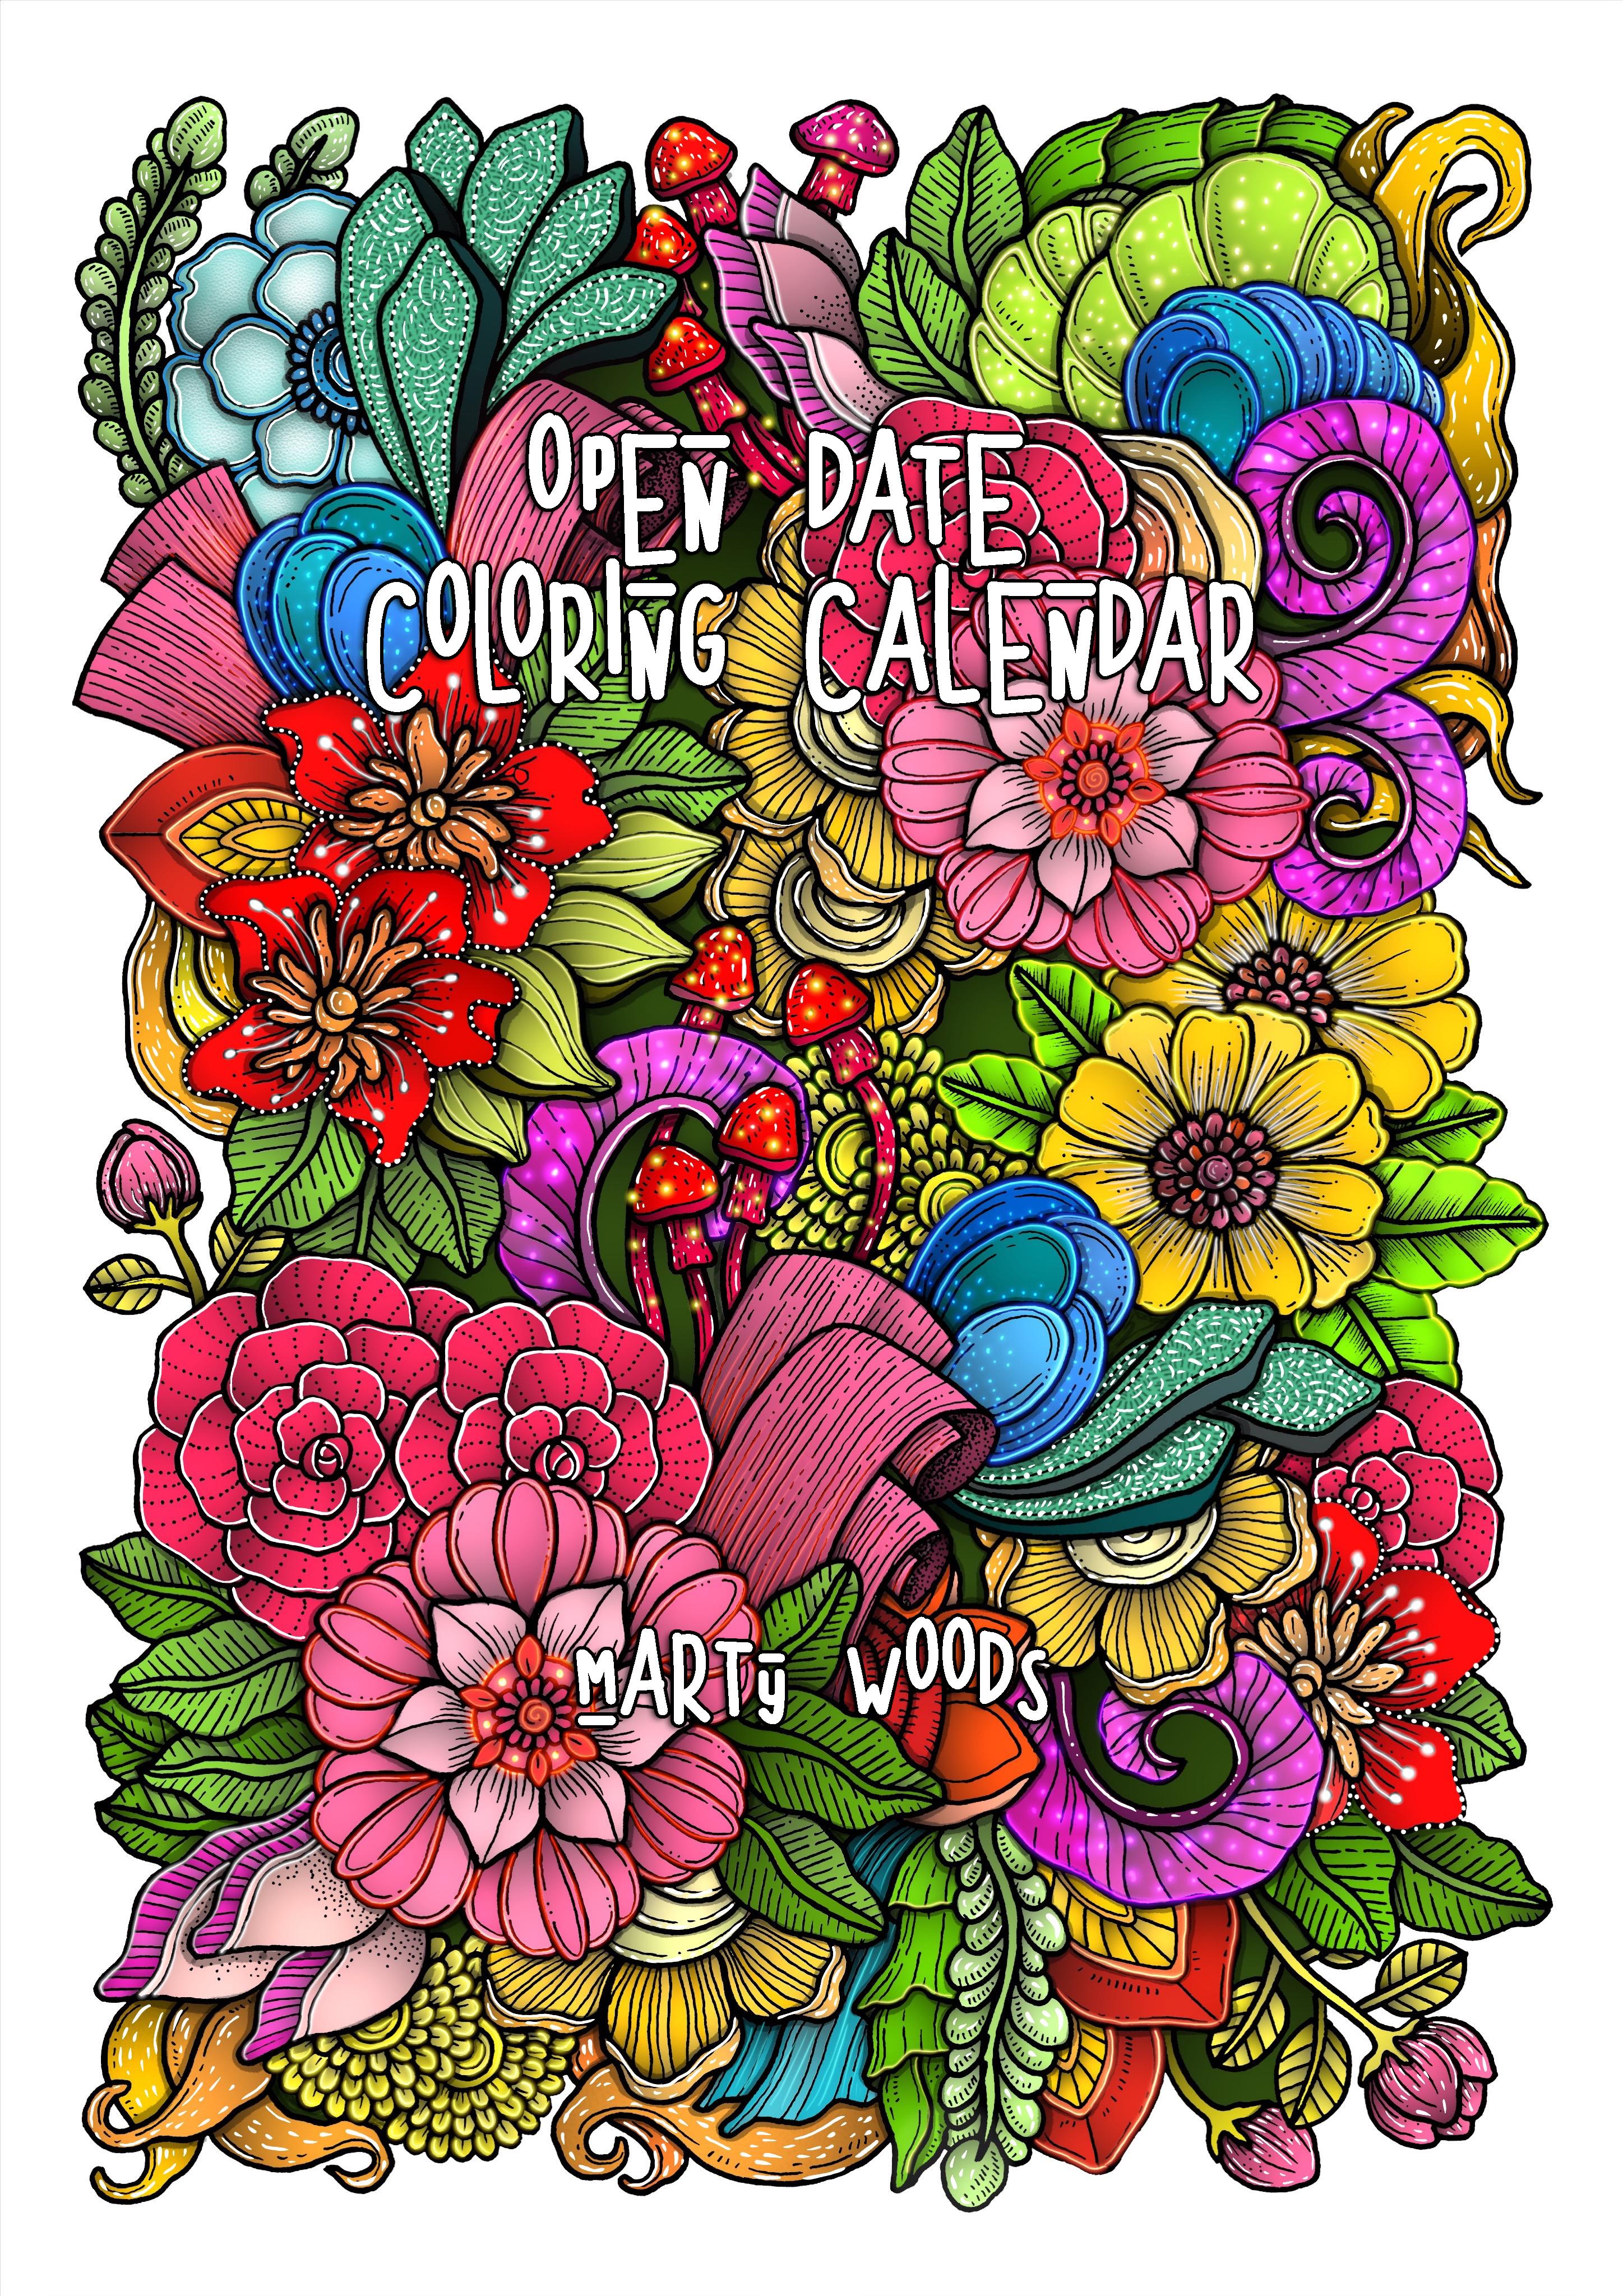 Open Date Coloring Calendar